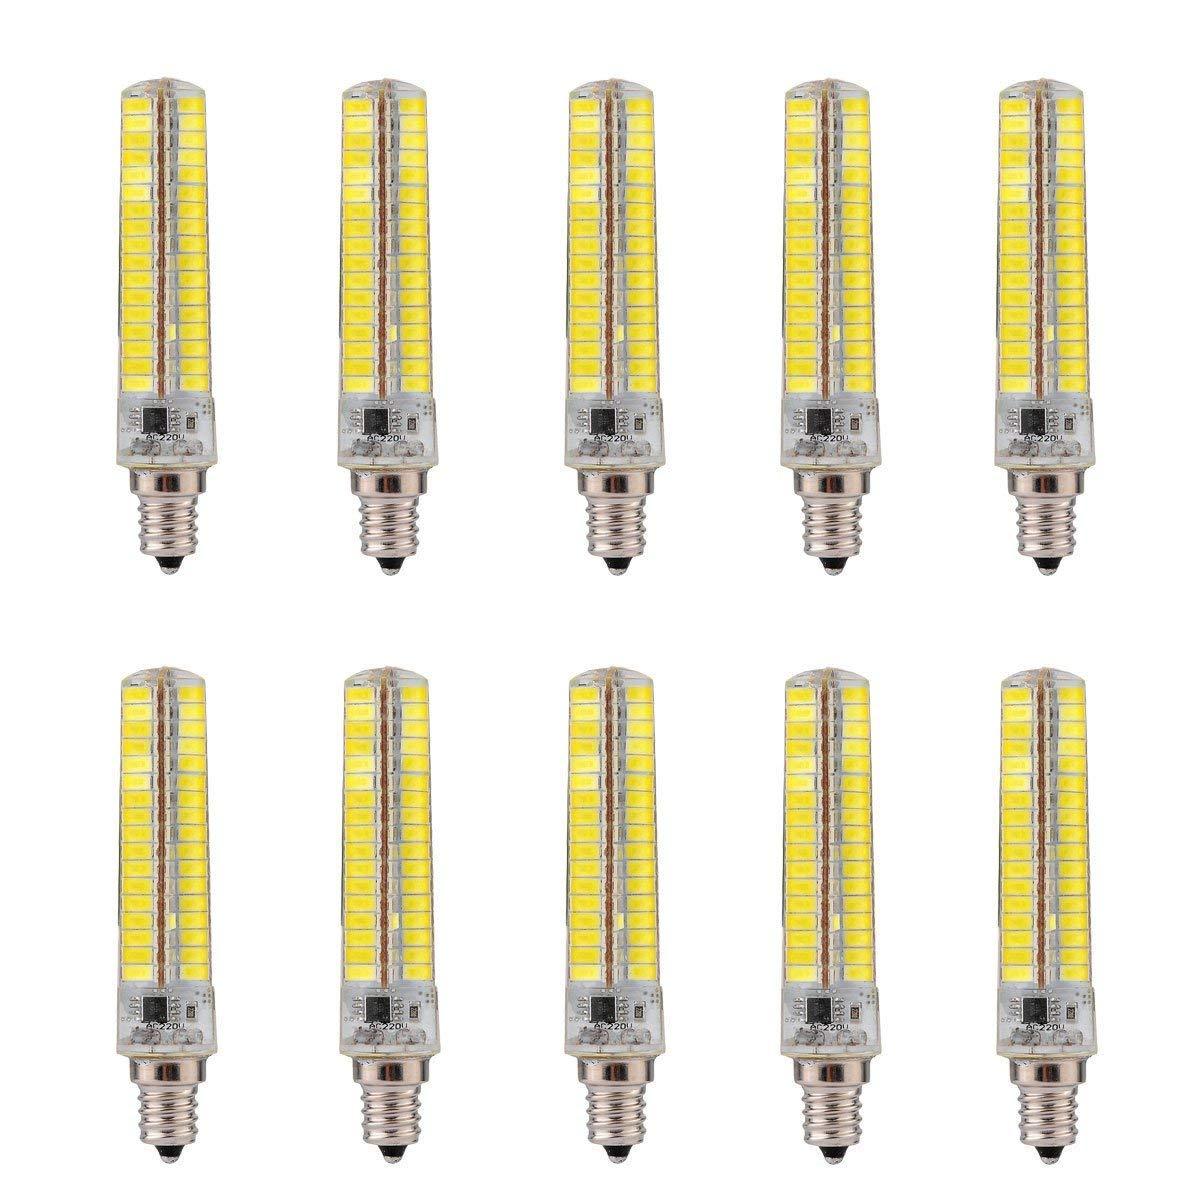 FuweiEncore Light Dimmbar E12 7W 136 SMD 5730 600-700 LM Warm Weiß Kaltweiß Maisbirnen AC 110V   AC 220V (Farbe   Warmes Weiß, Großauswa  220v) (Farbe   Warmes Weiß, Größe   110V)